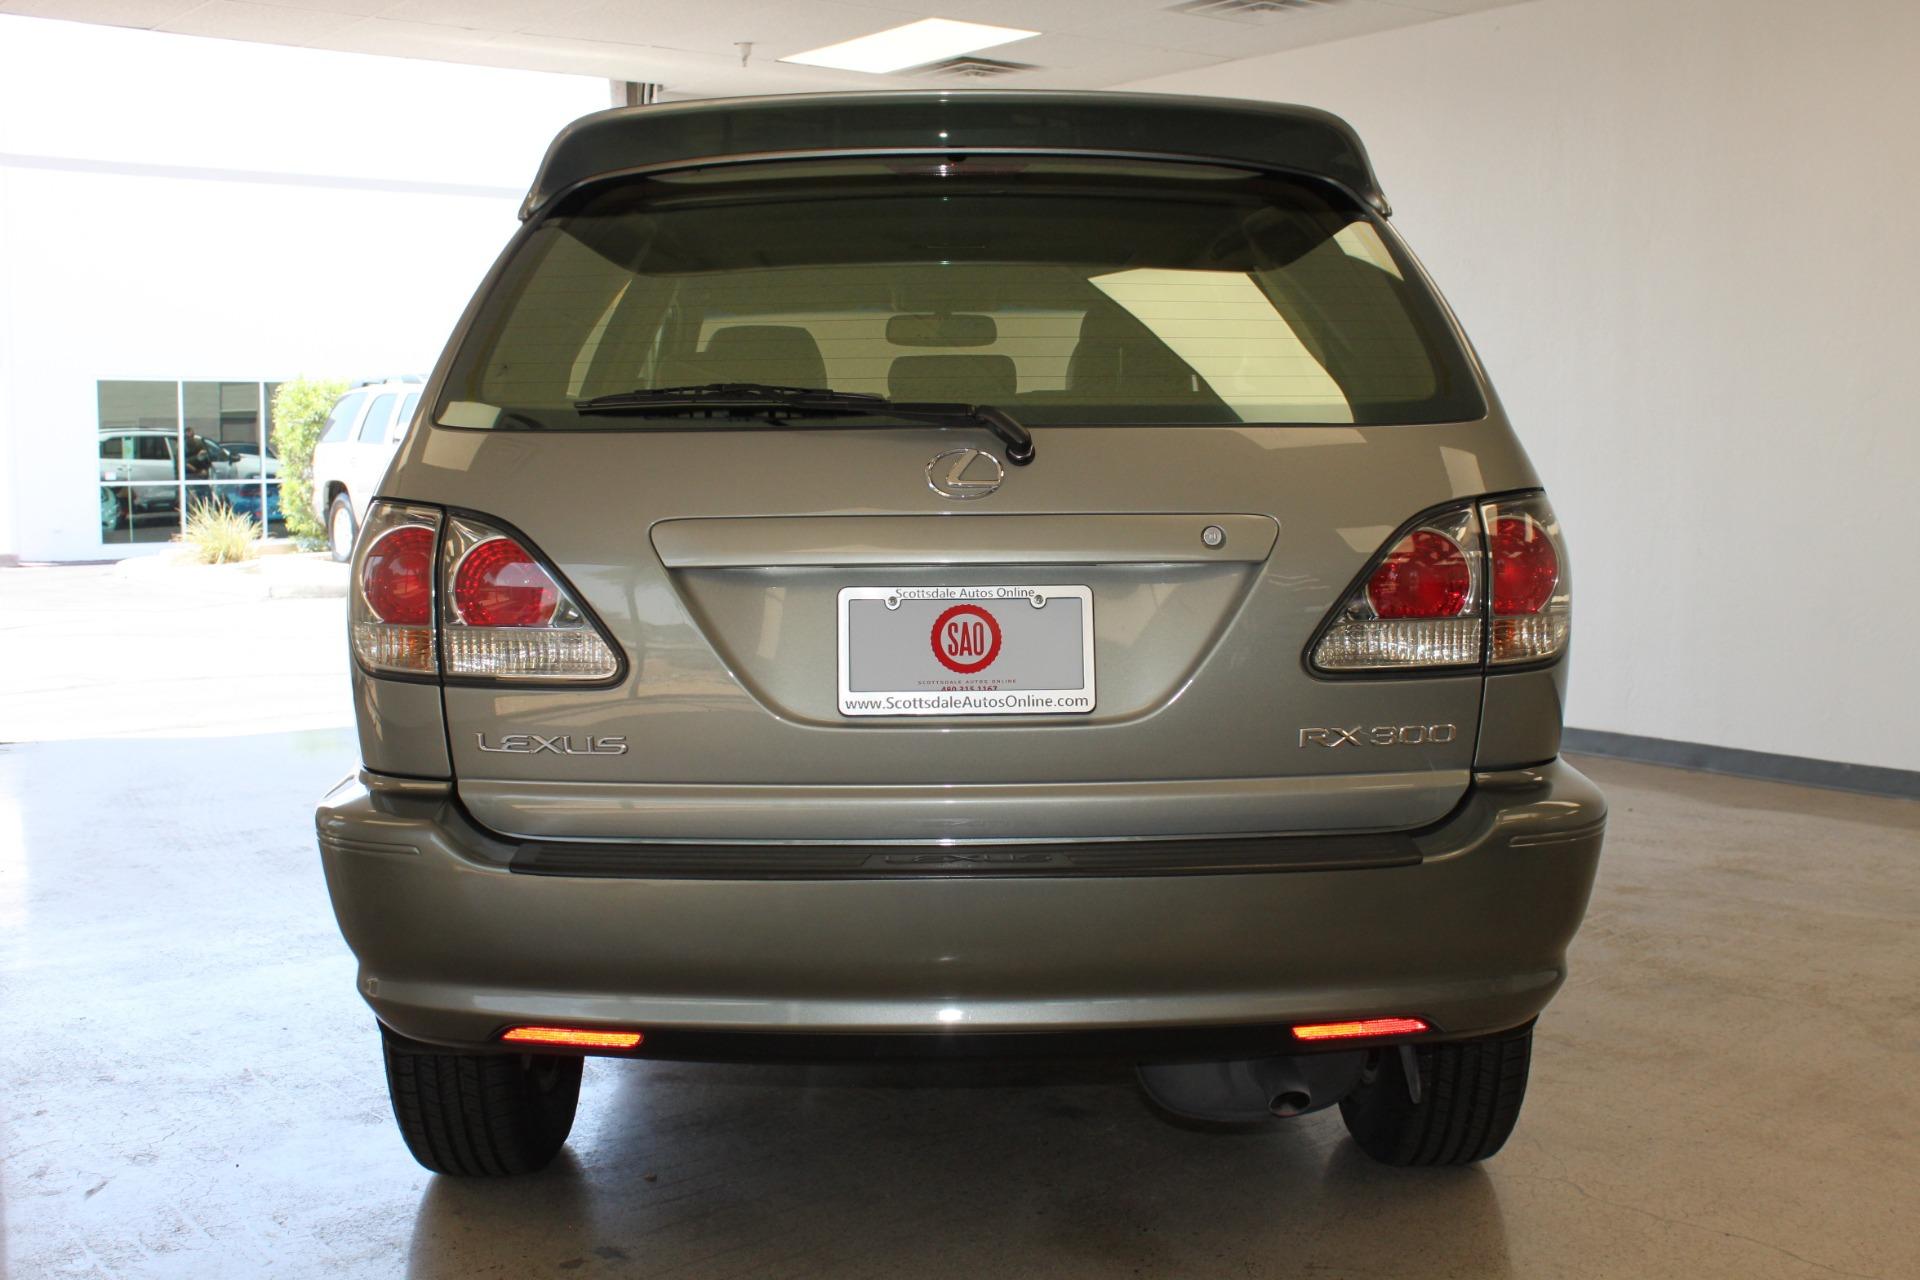 Used-2002-Lexus-RX-300-Mopar